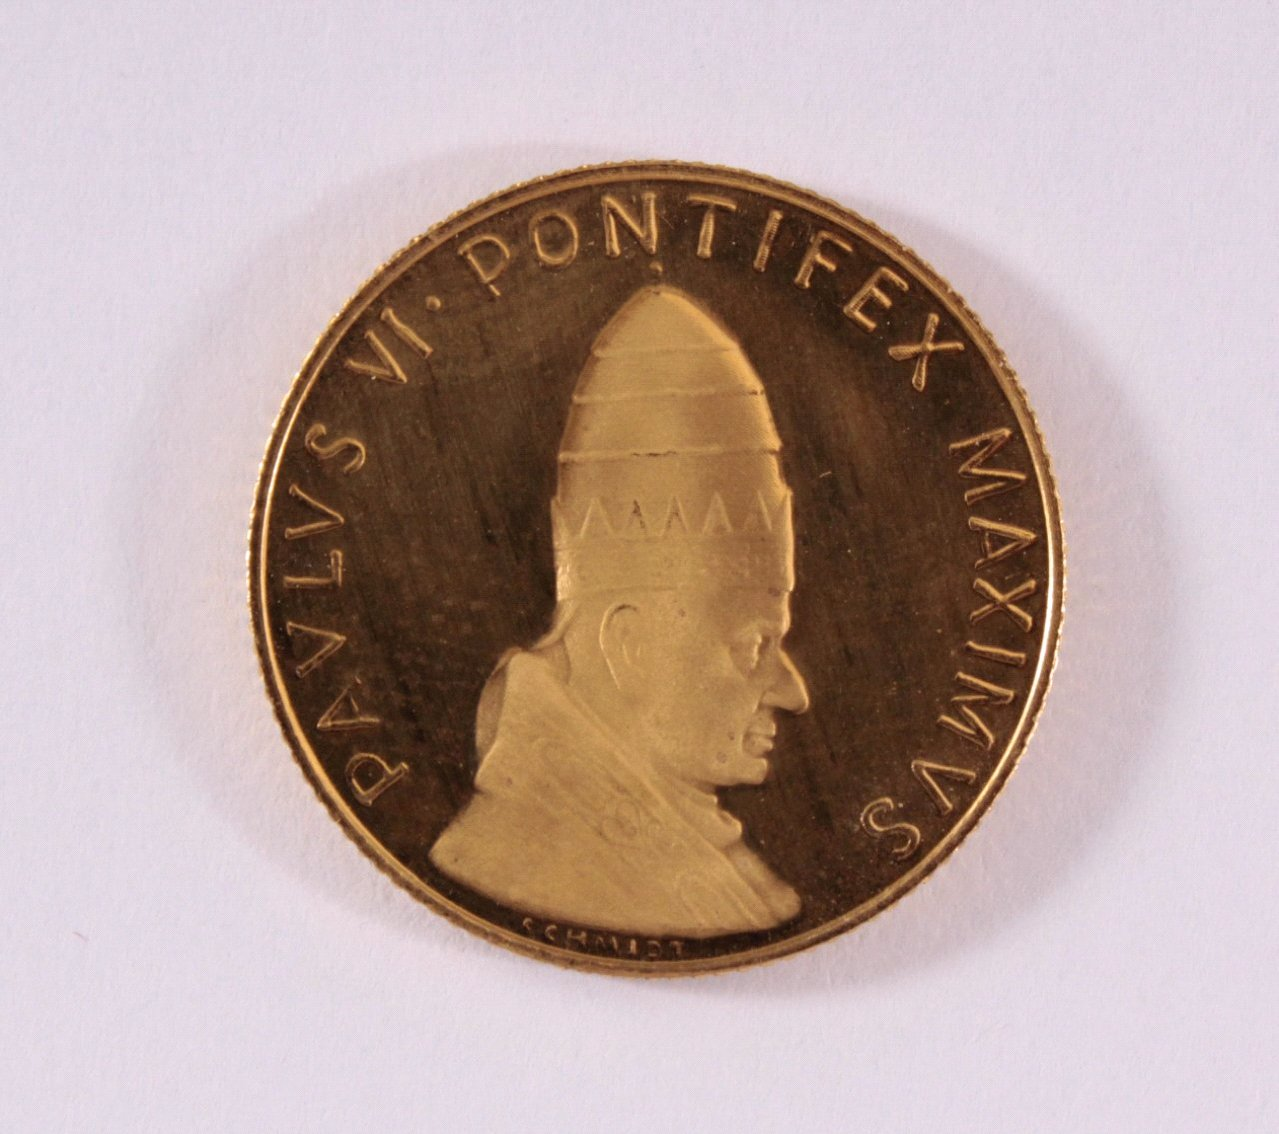 Goldmedaille 900/000 GG. Paulus Pontifex Maximus